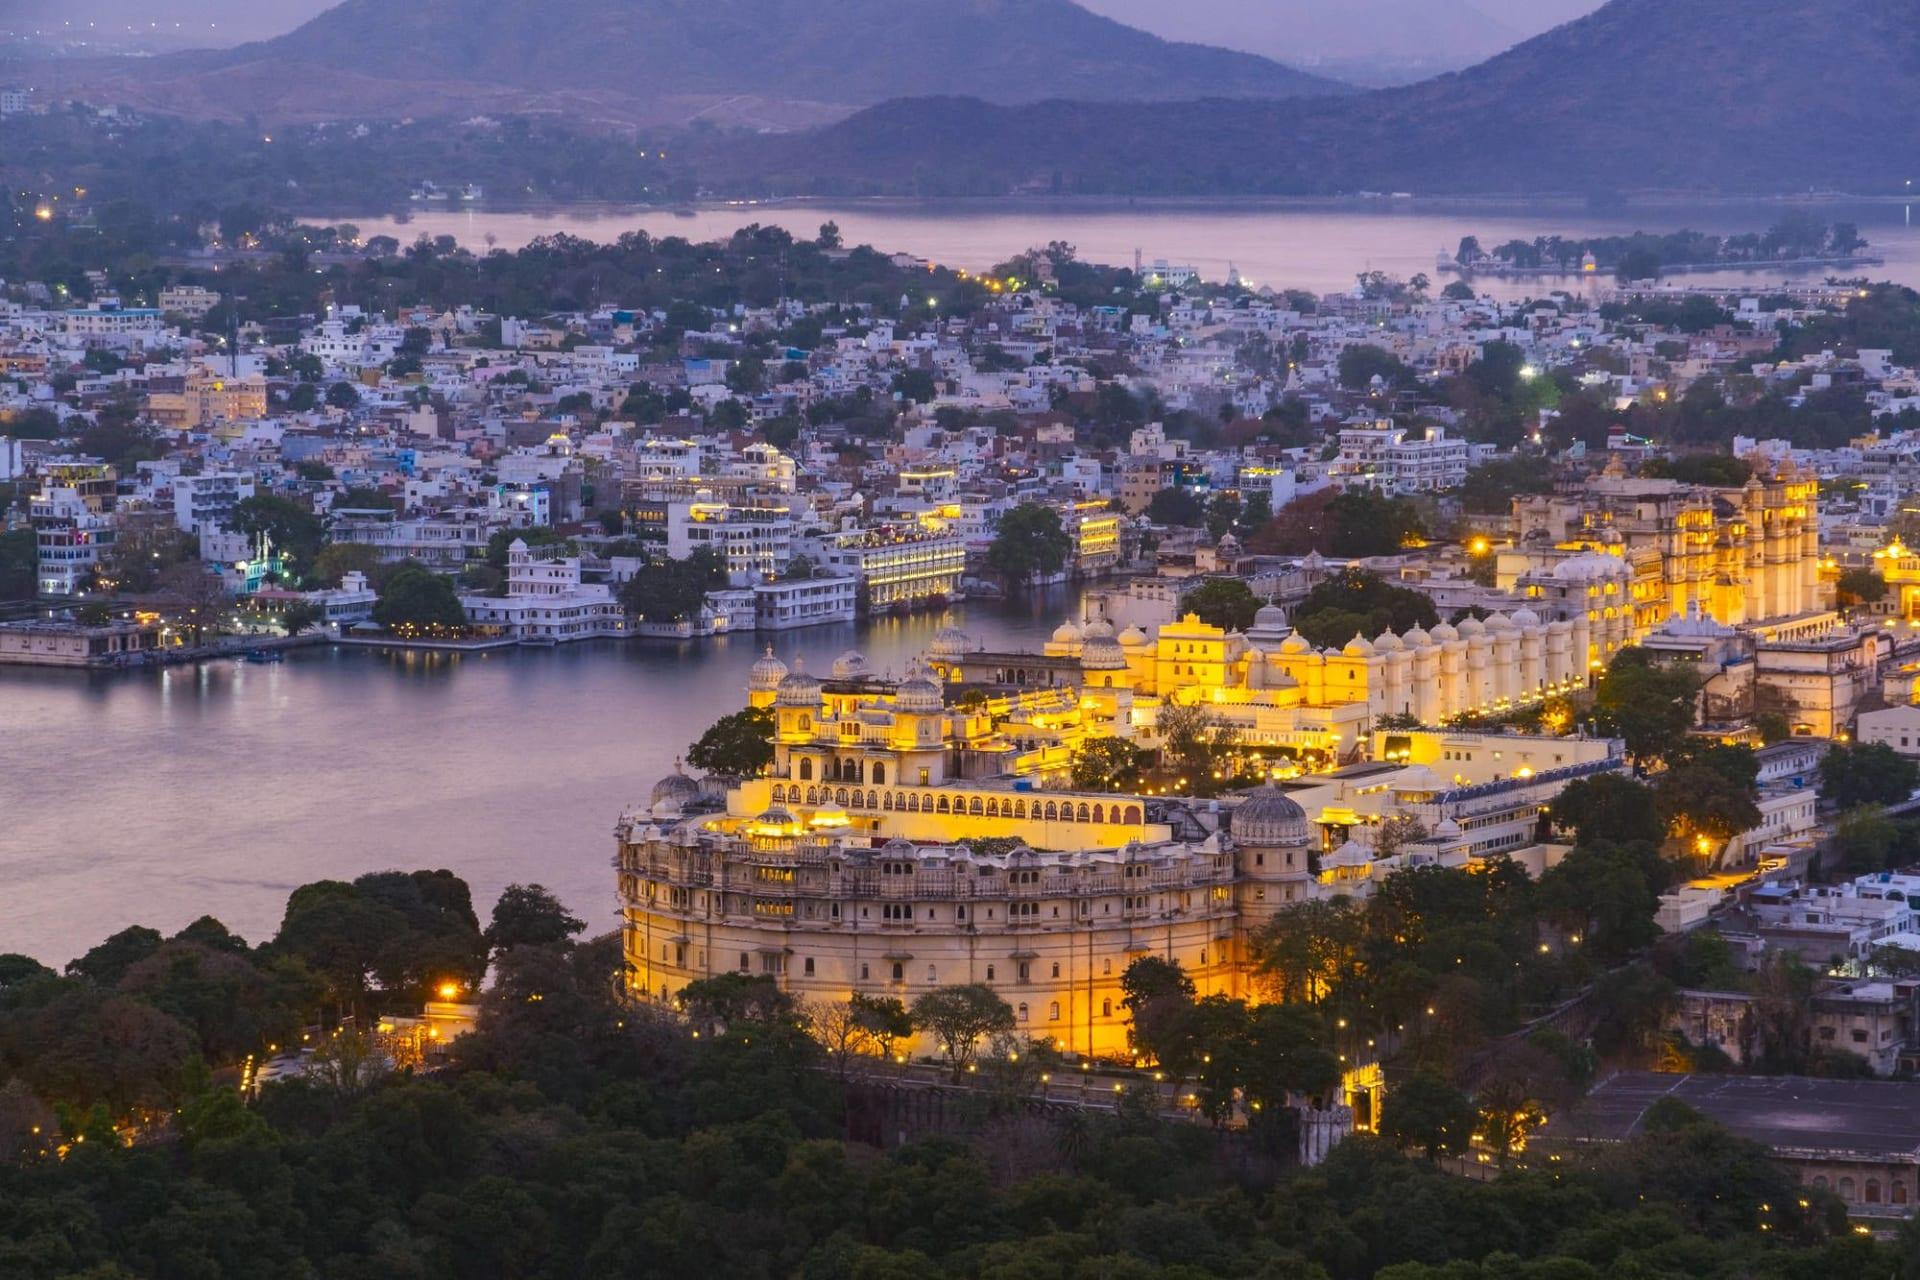 Udaipur City with Lake Pichola